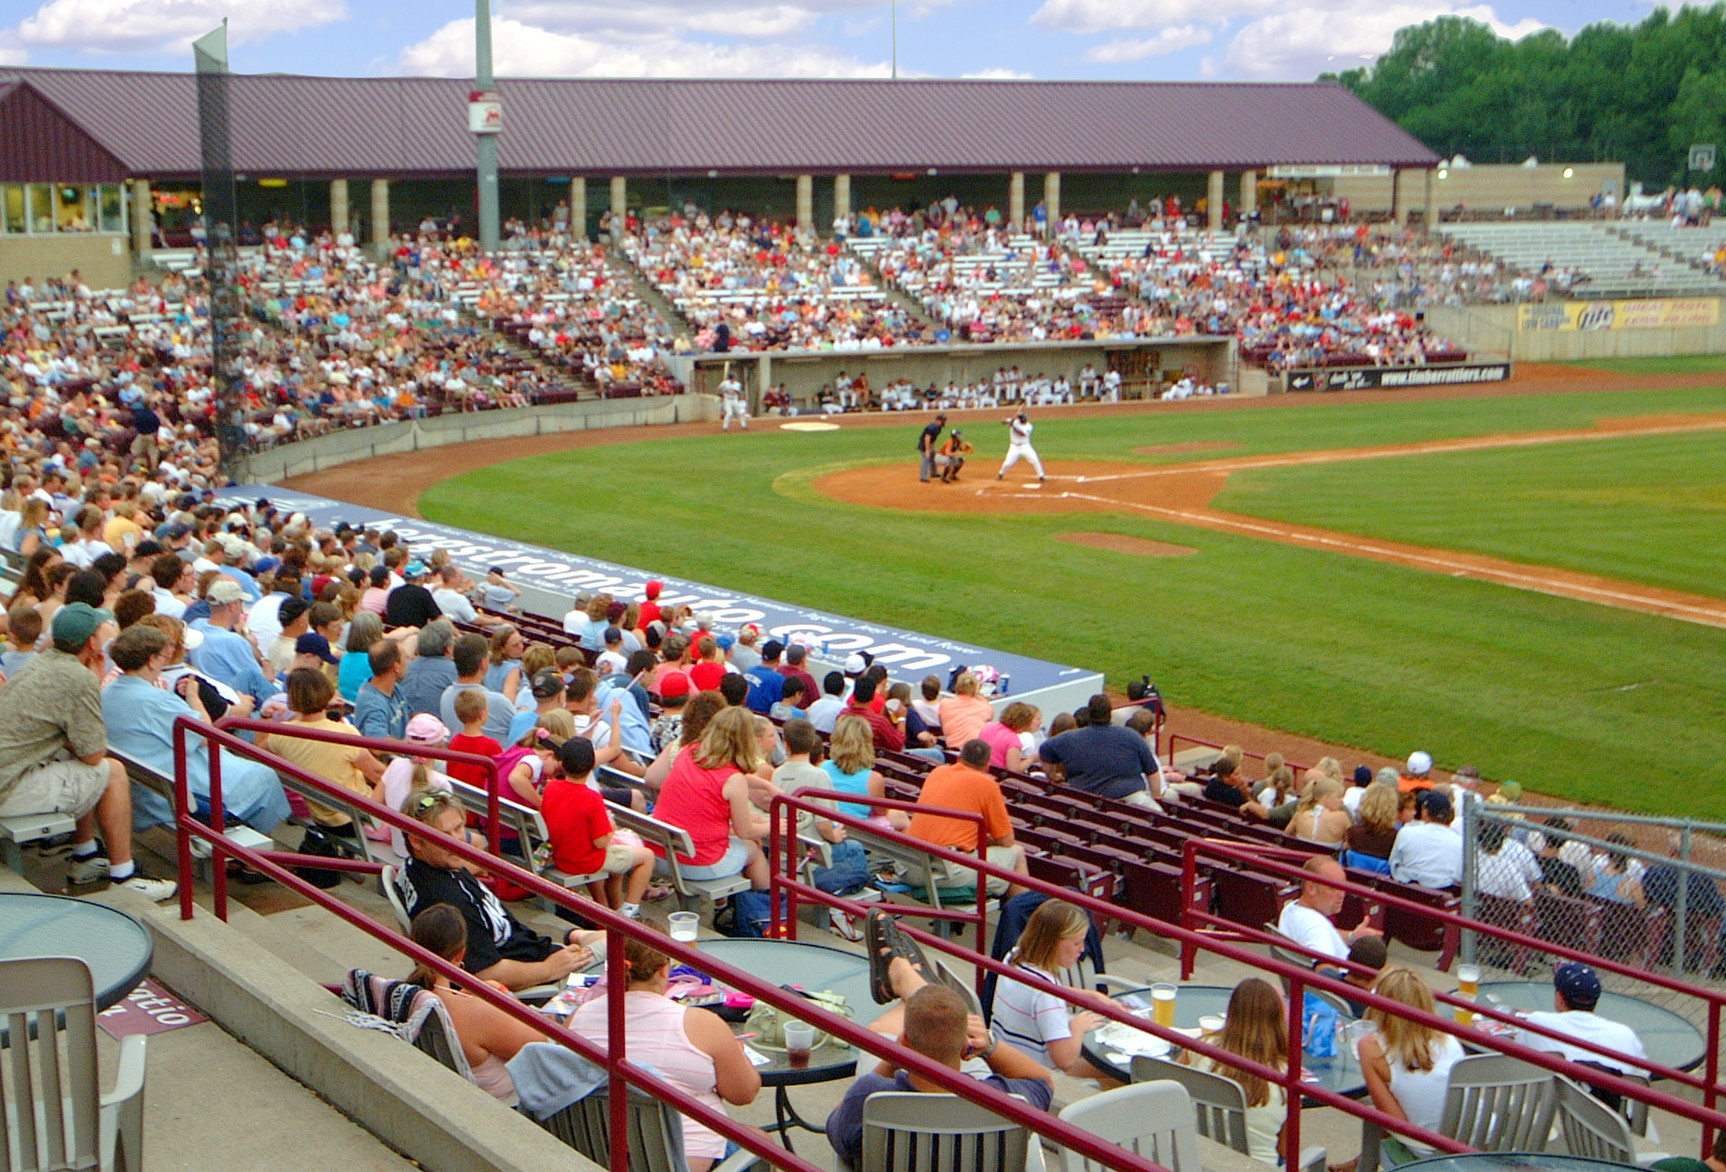 Fox Cities Stadium fans watching a Timber Rattlers baseball game